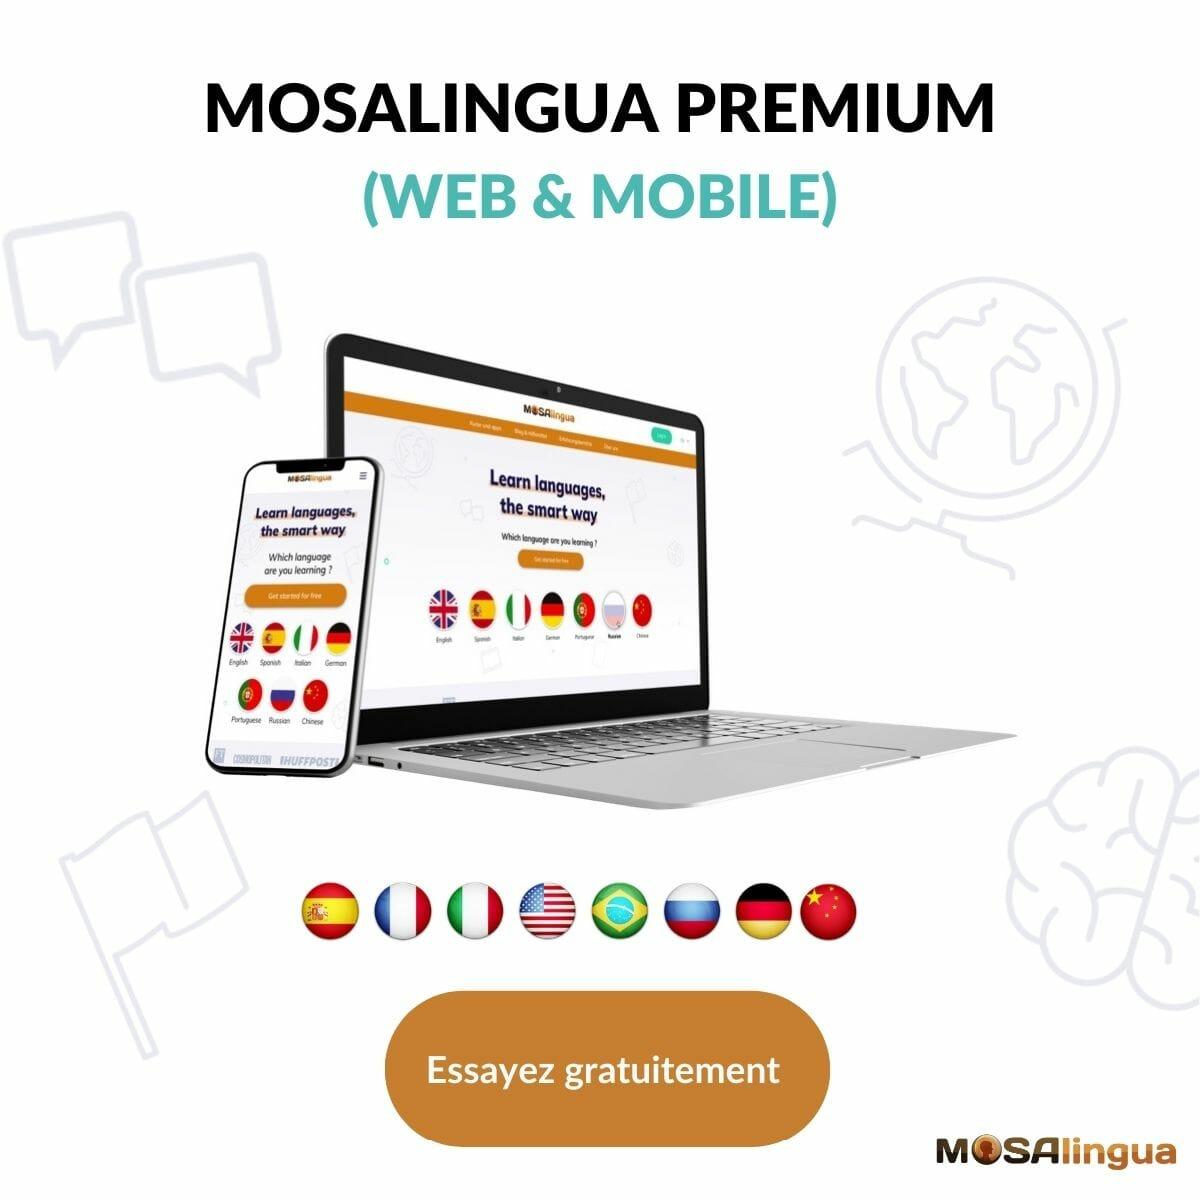 Apprendre des langues avec Mosalingua